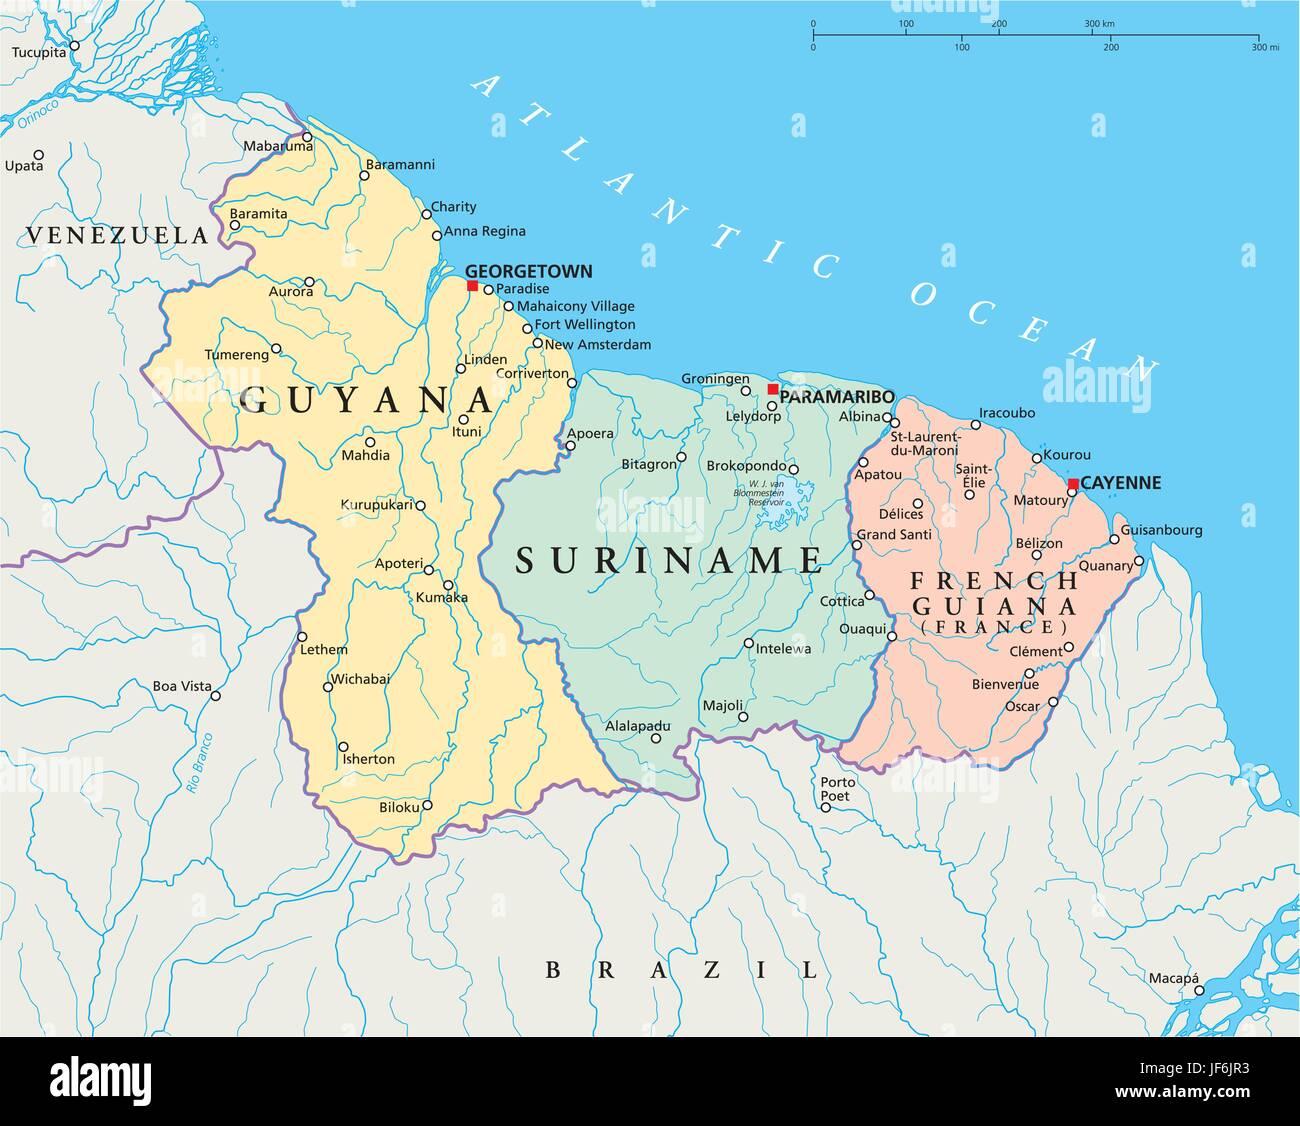 South America Suriname Guyana Map Atlas Map Of The World - Suriname map